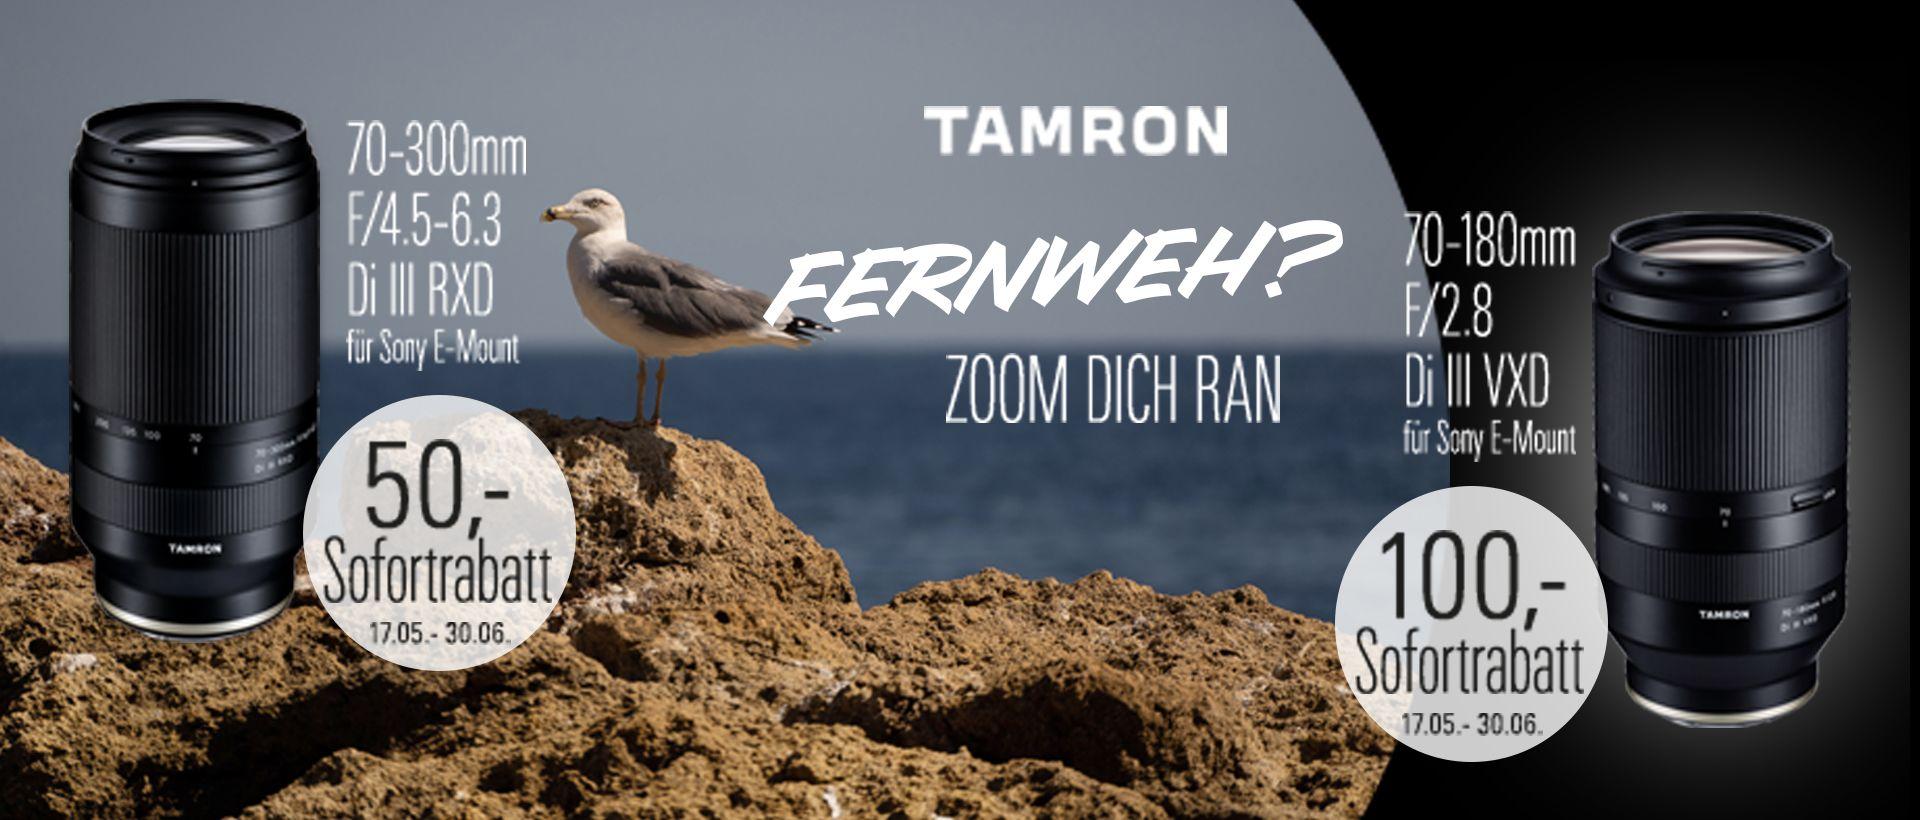 Tamron Sofortrabatt